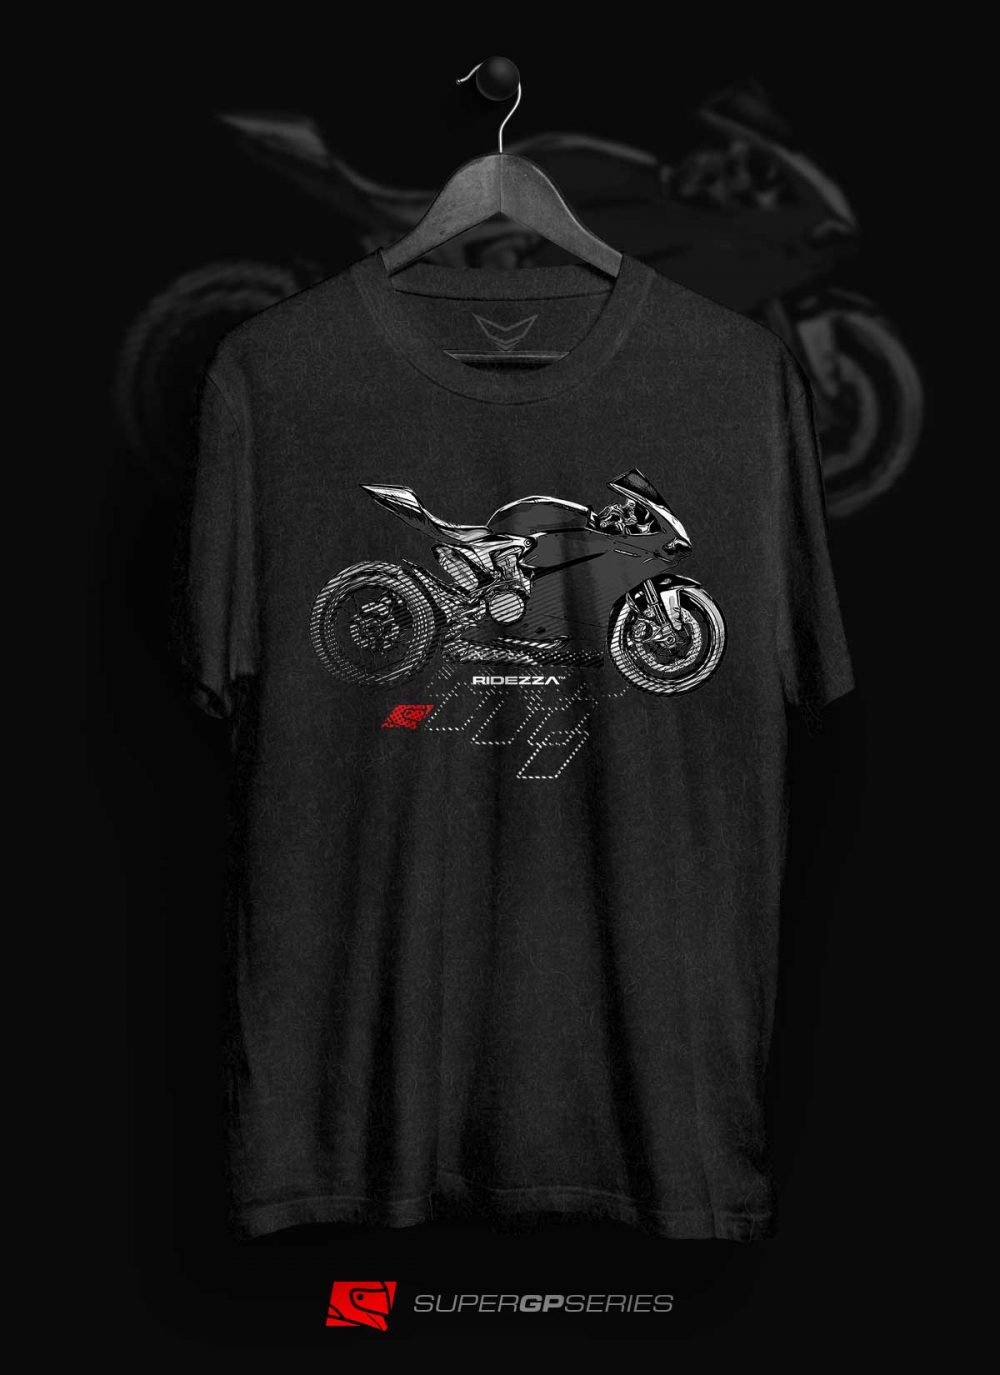 Ridezza Panigale SuperGP Series T-Shirt